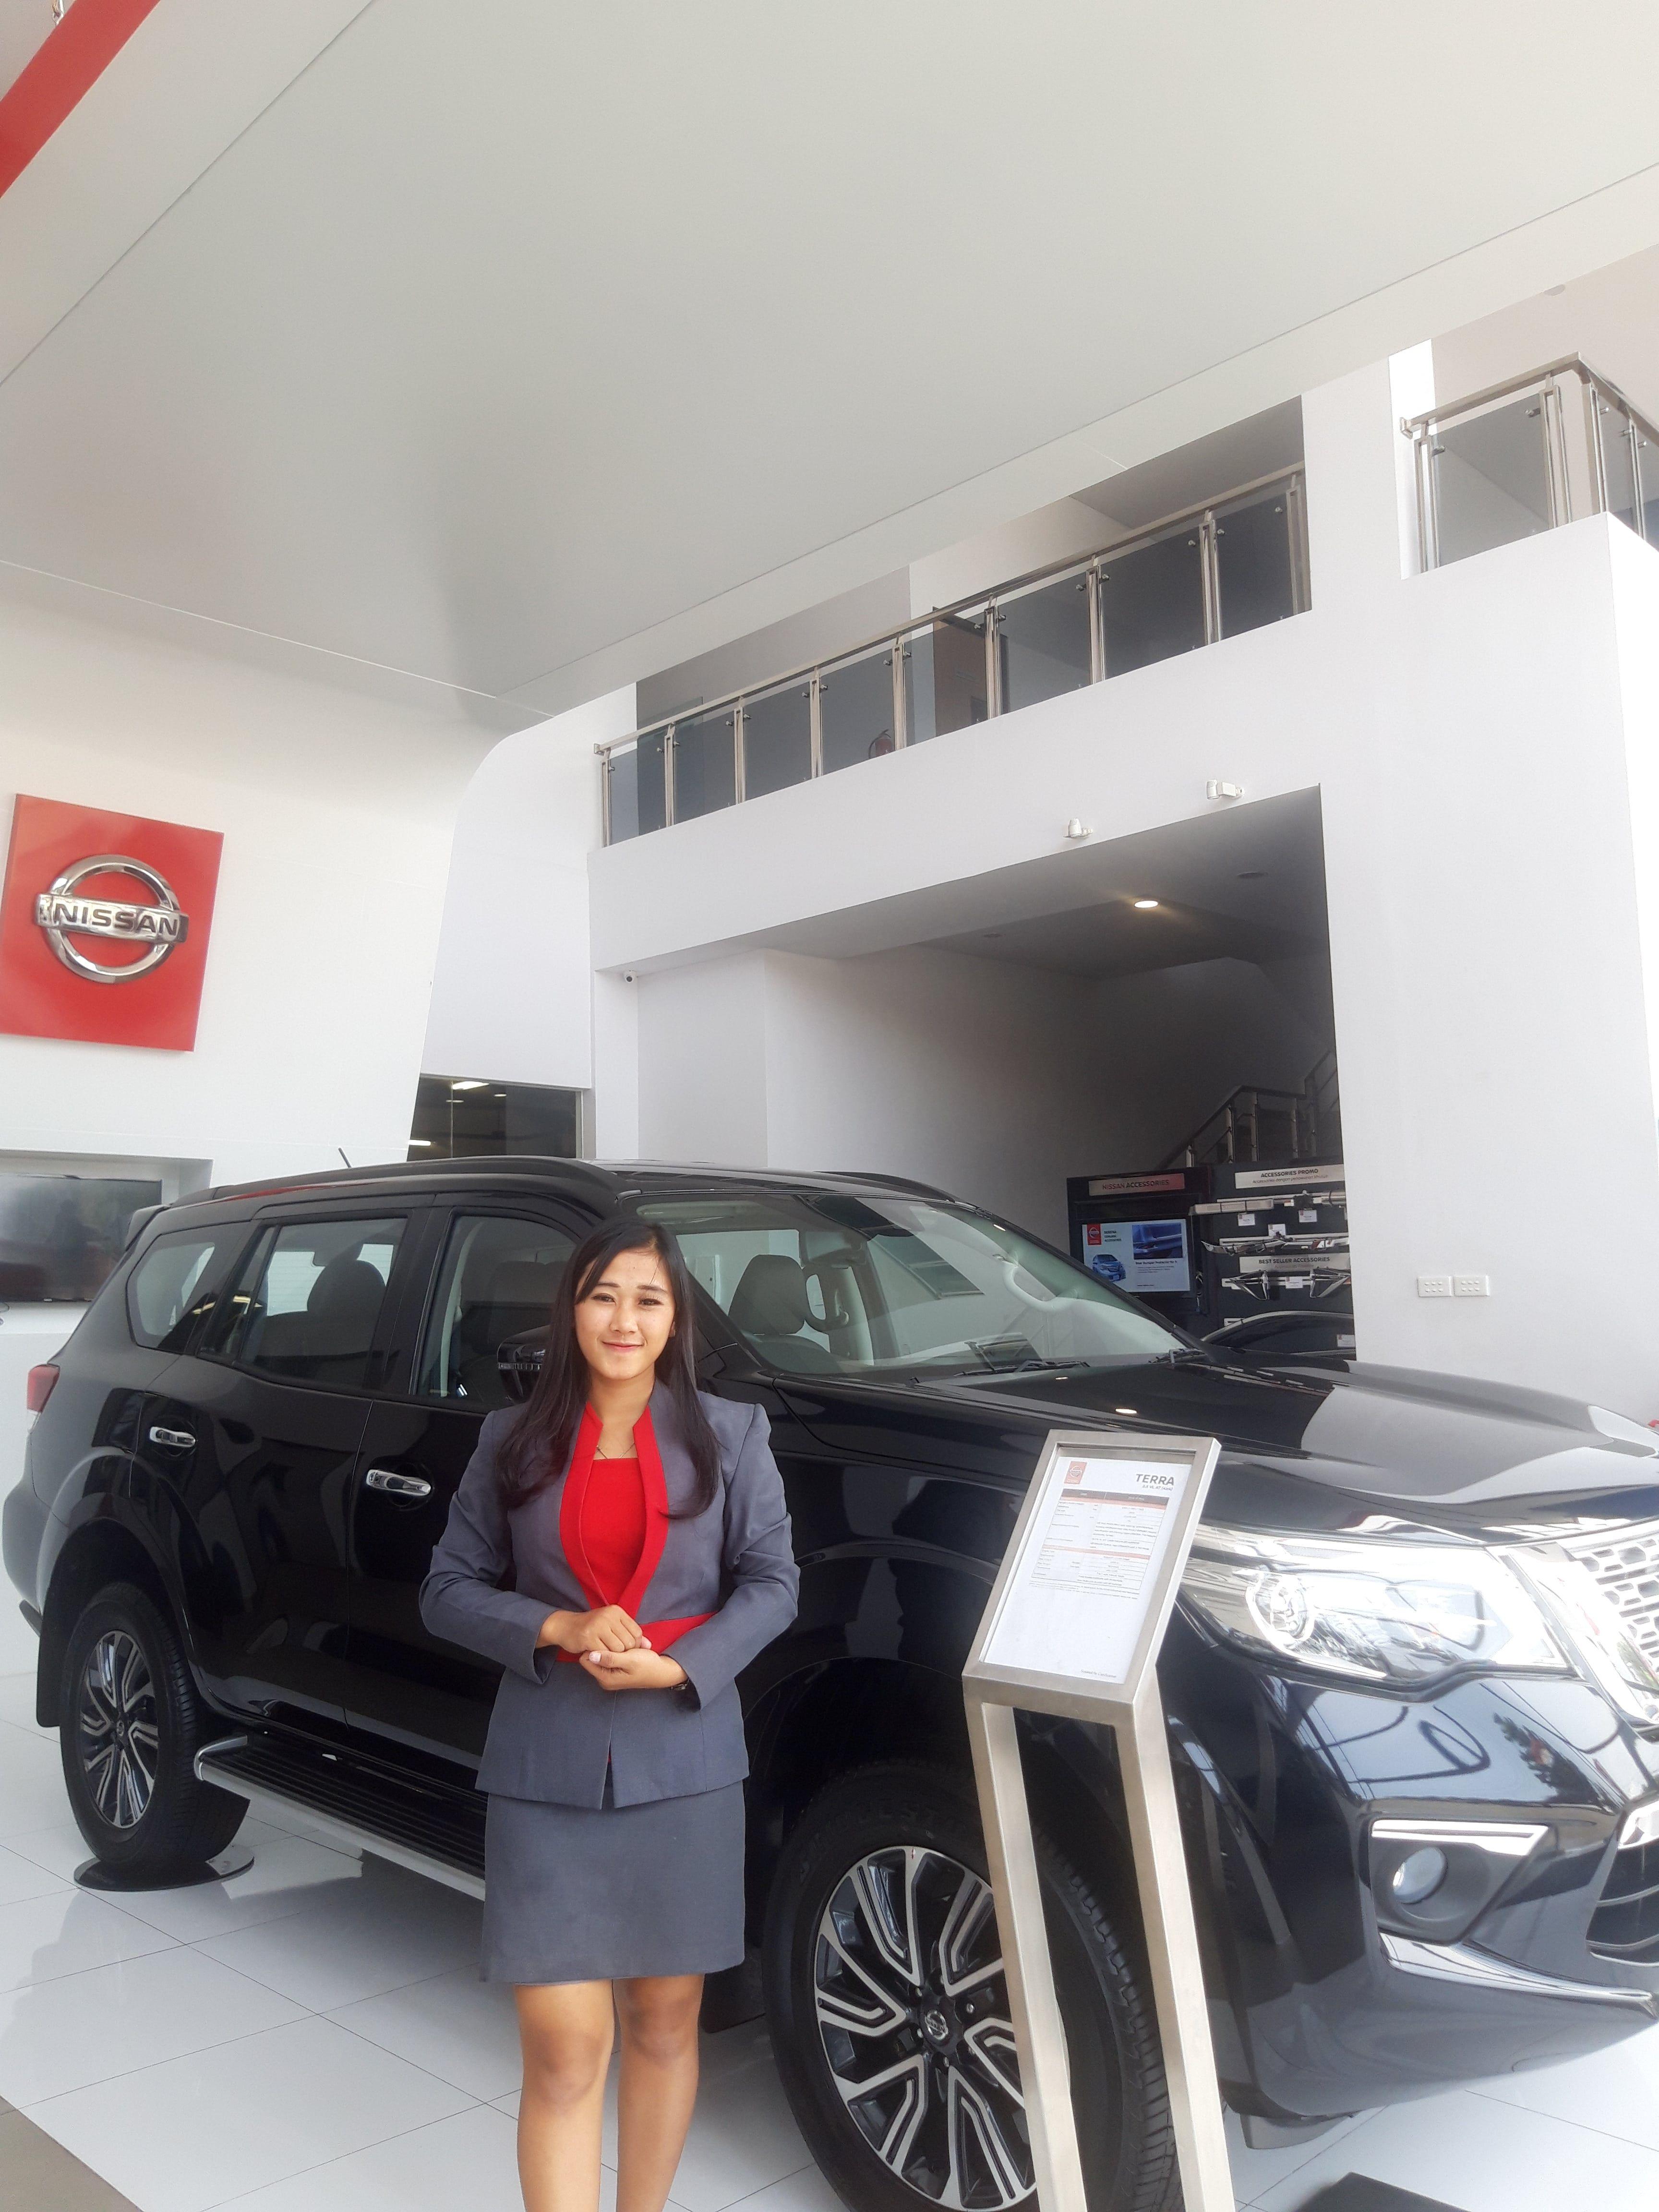 Dealer Mobil Nissan Cikupa Kabupaten Tangerang Mobils Id Nissan Mobil Baru 4x4